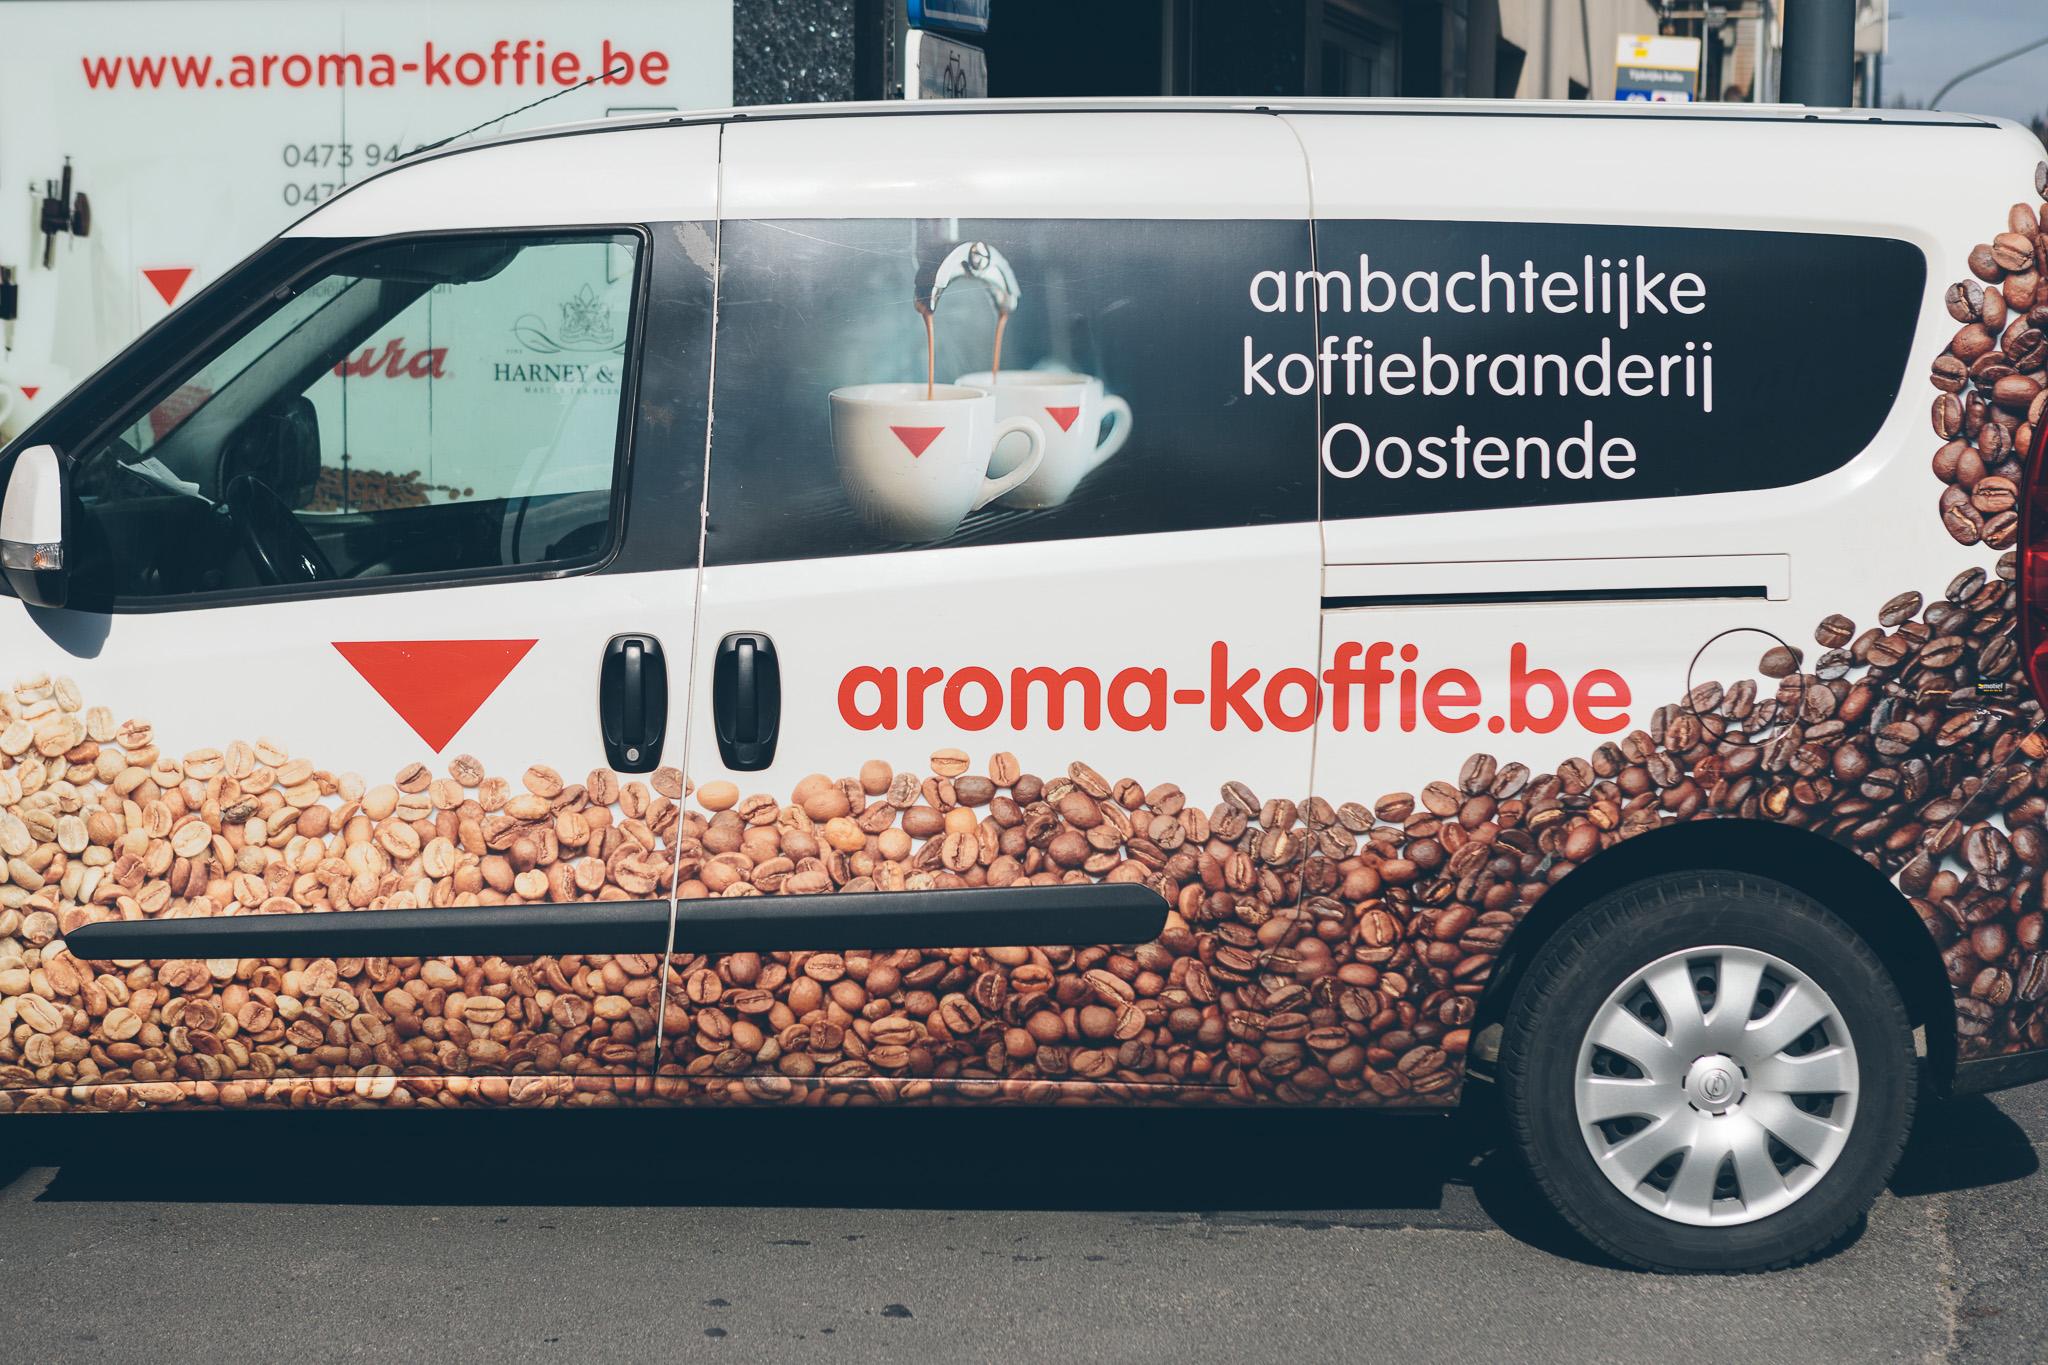 Aroma Koffie Oostende Ambacht